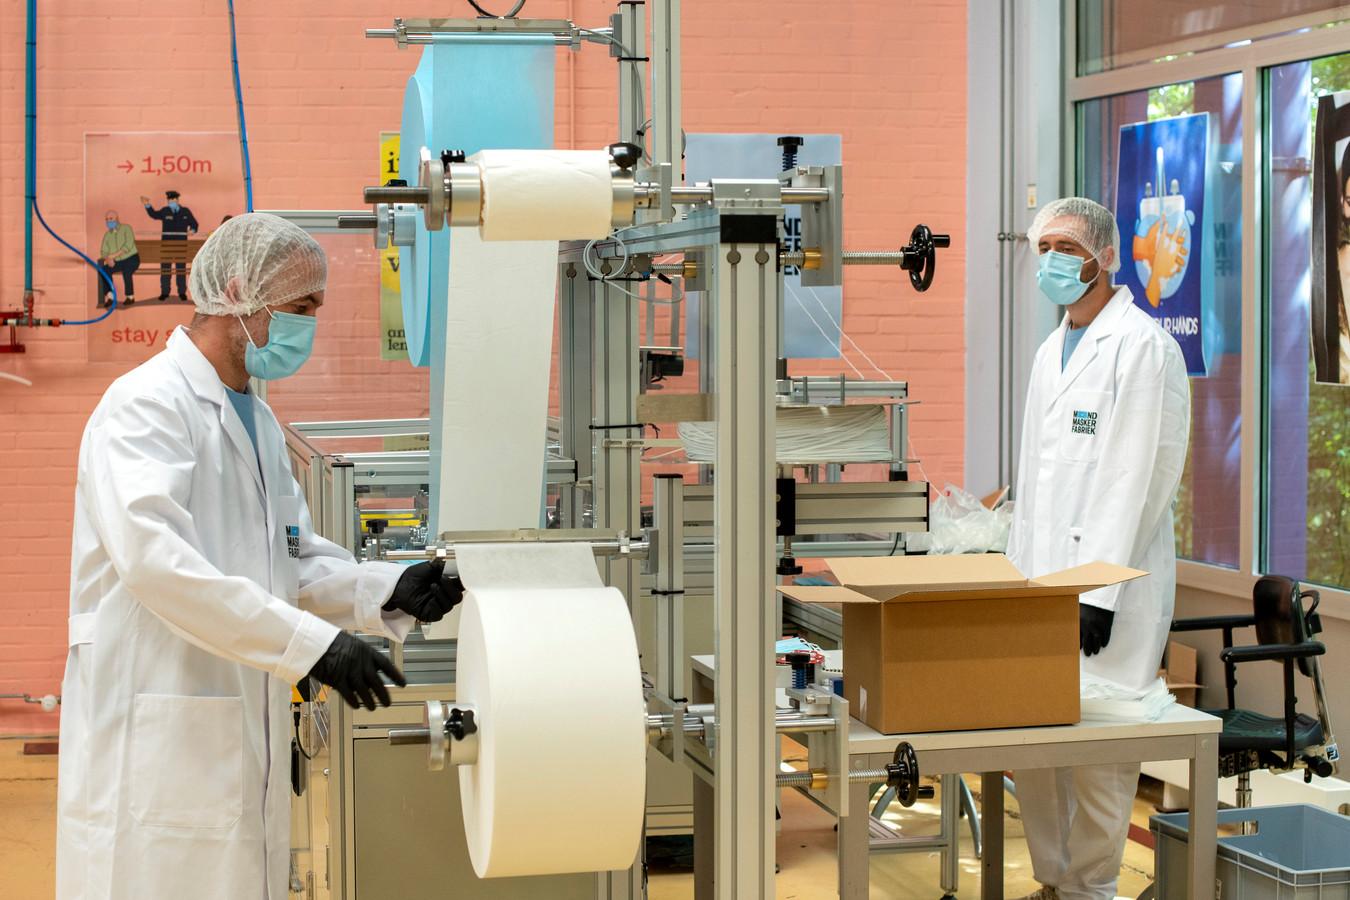 De Mondmaskerfabriek in Arnhem